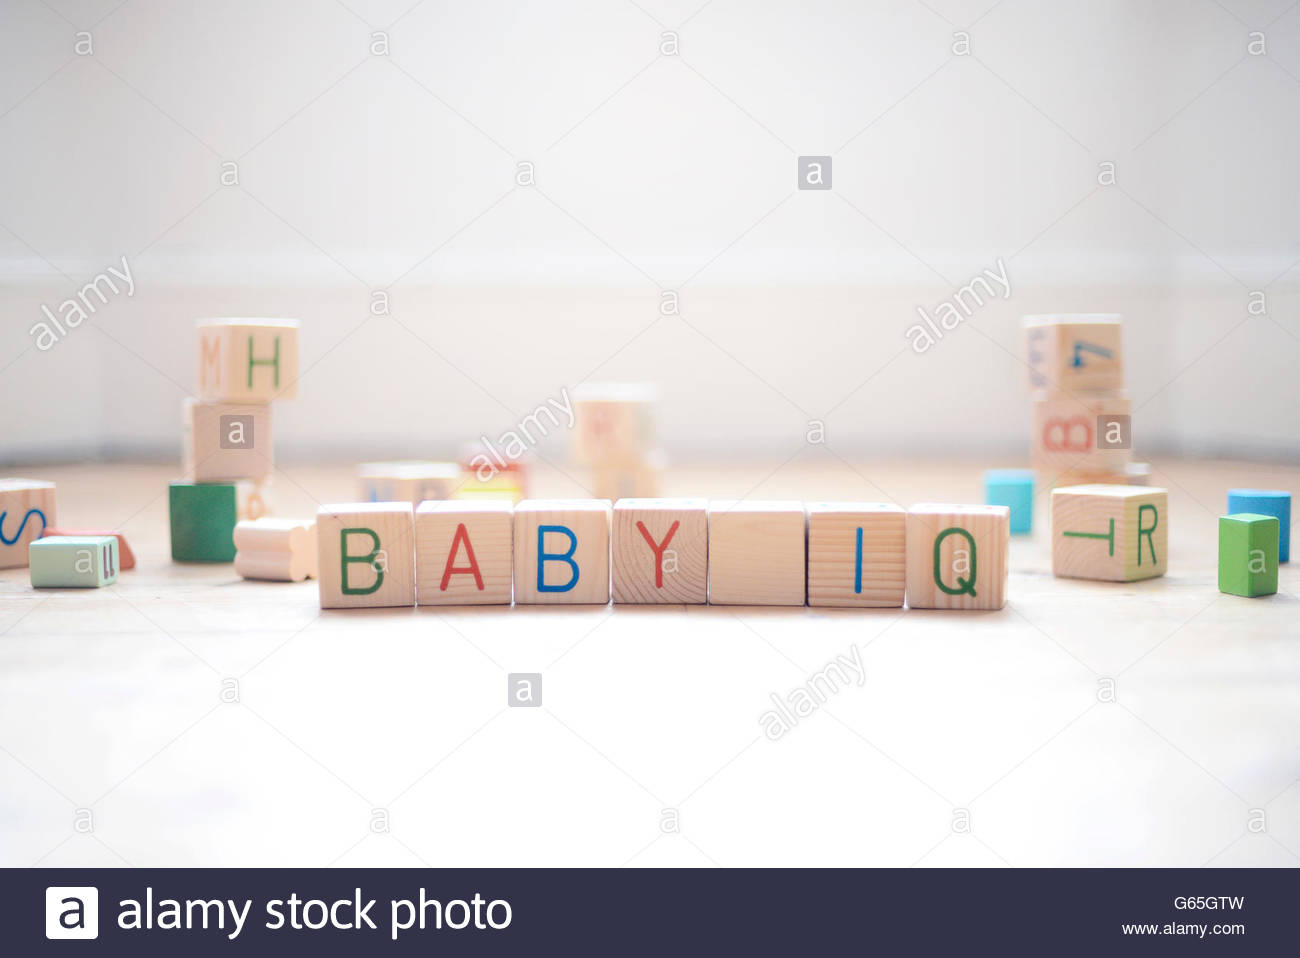 Baby IQ in play blocks - Stock Image